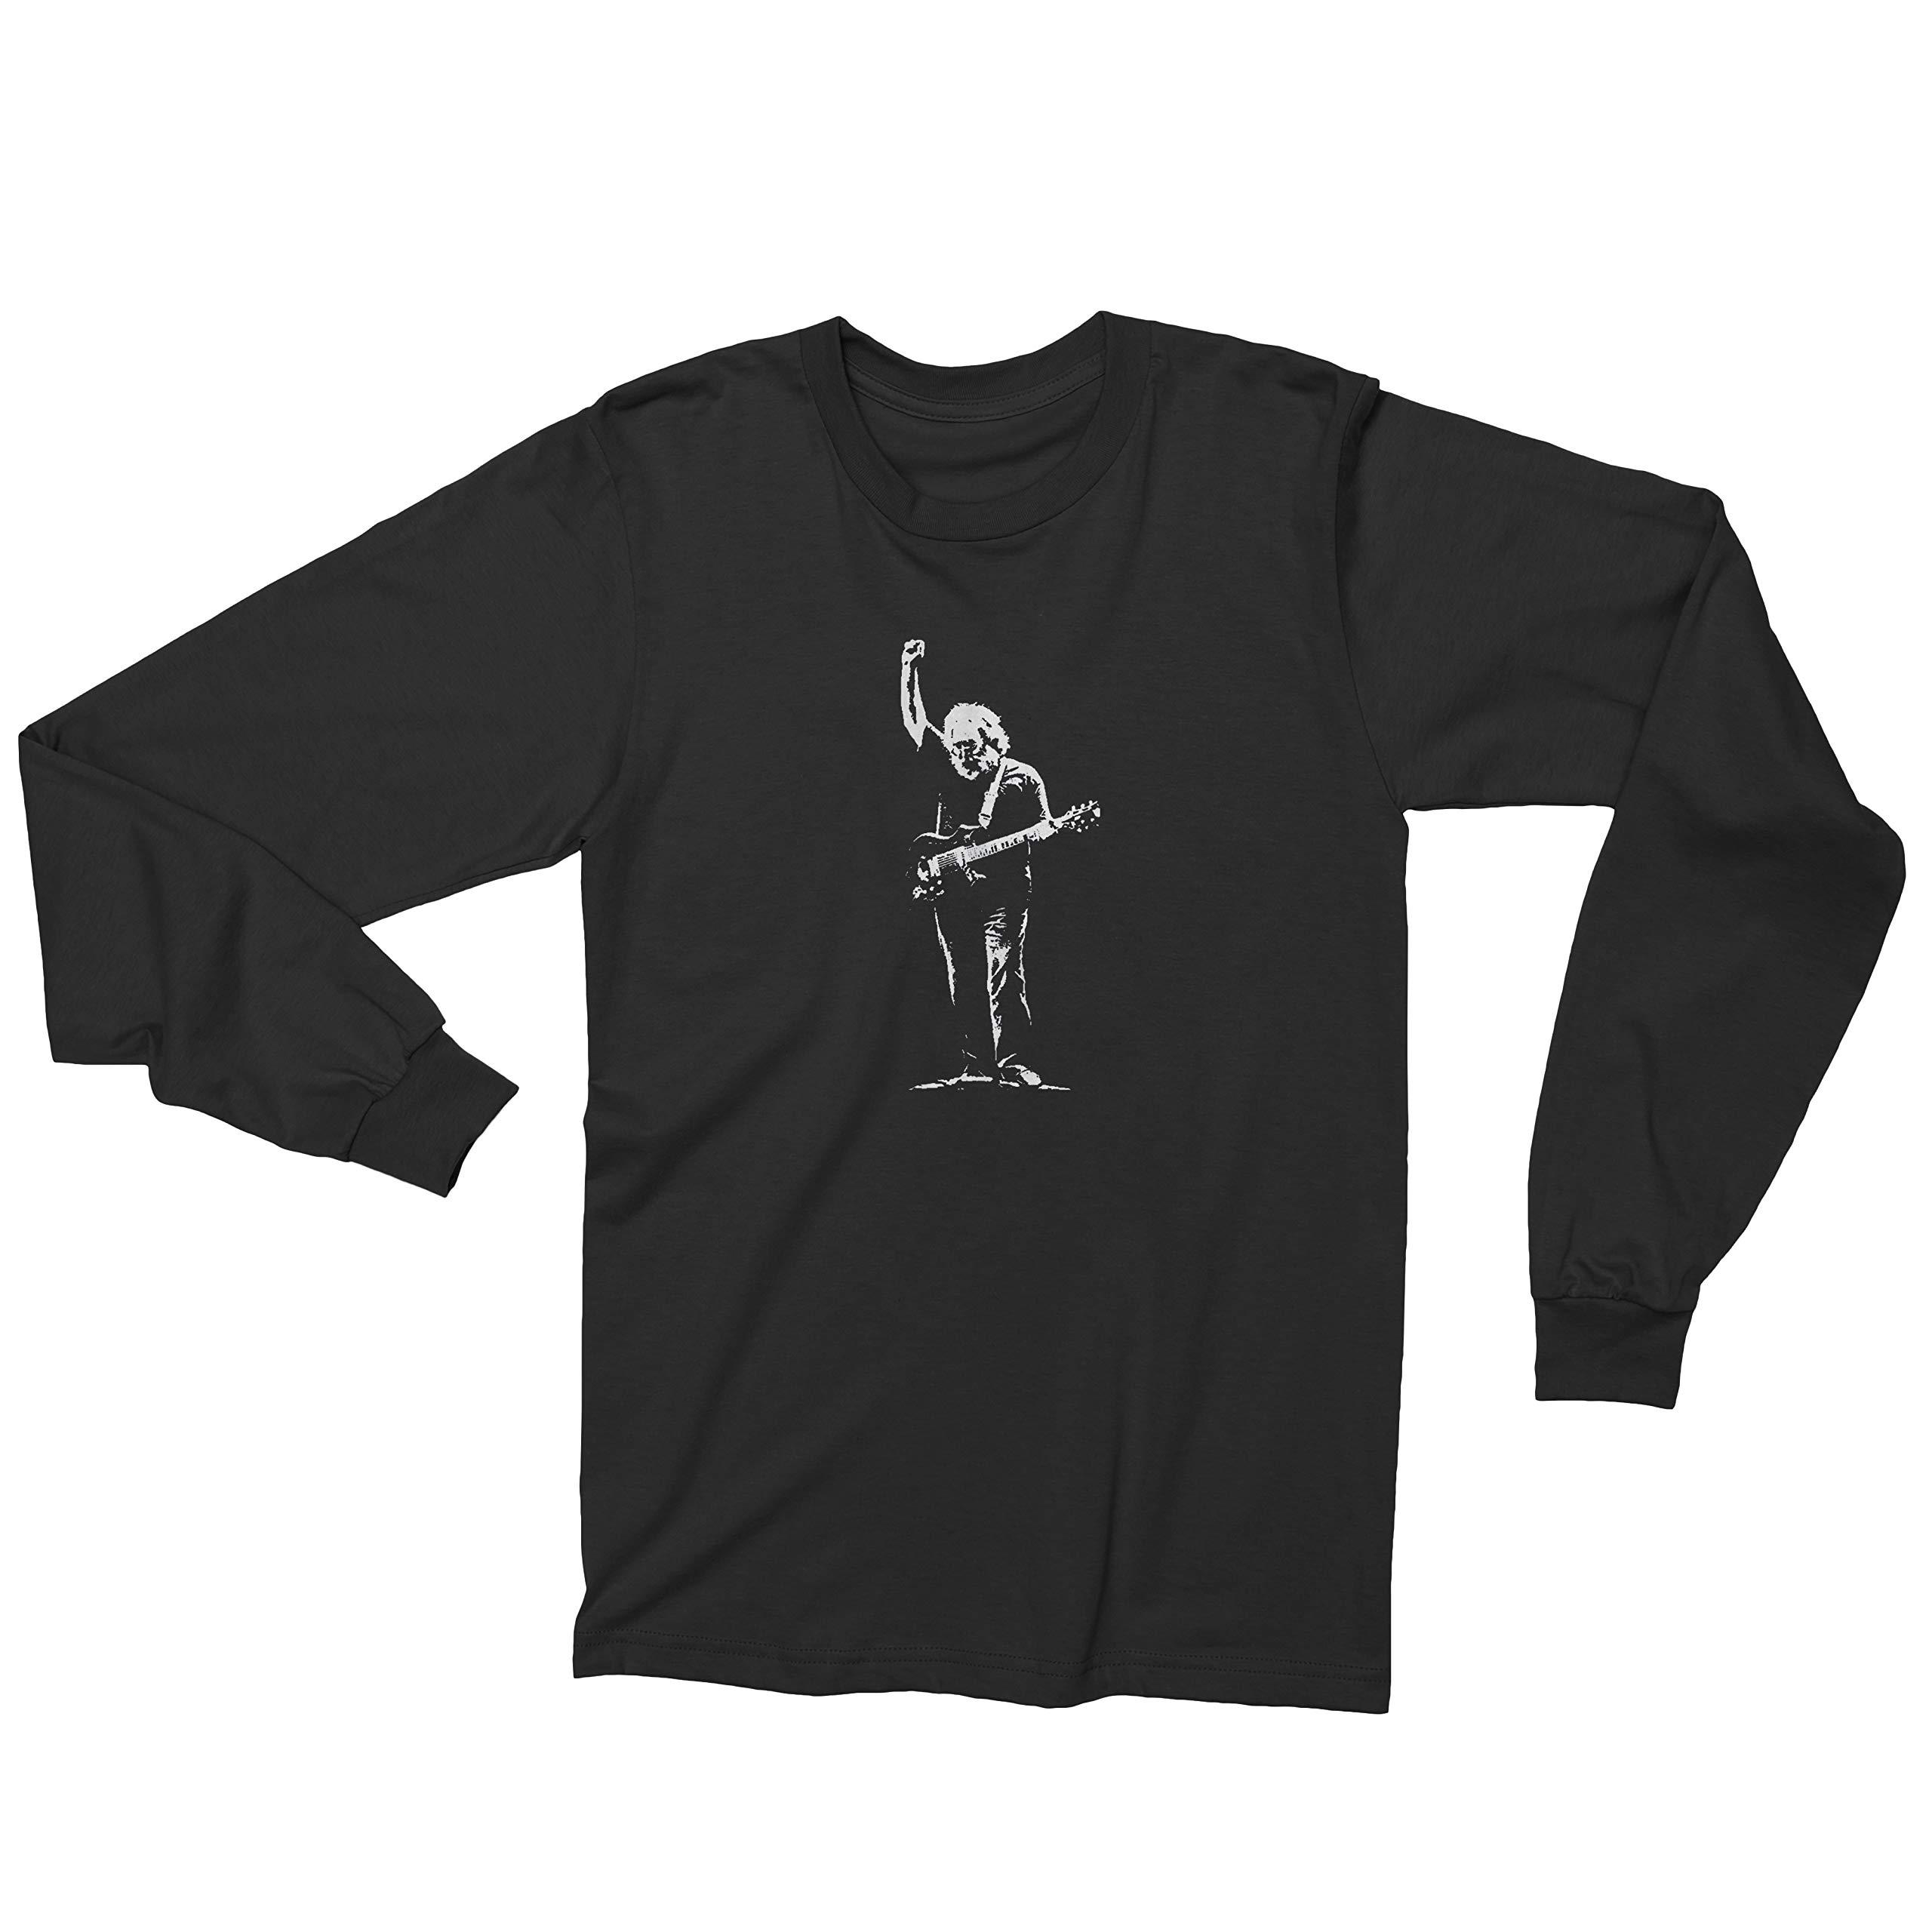 ZJ Designs Jerry Garcia Tribute Lot T-Shirt Grateful JGB Inspired Longsleeve tee